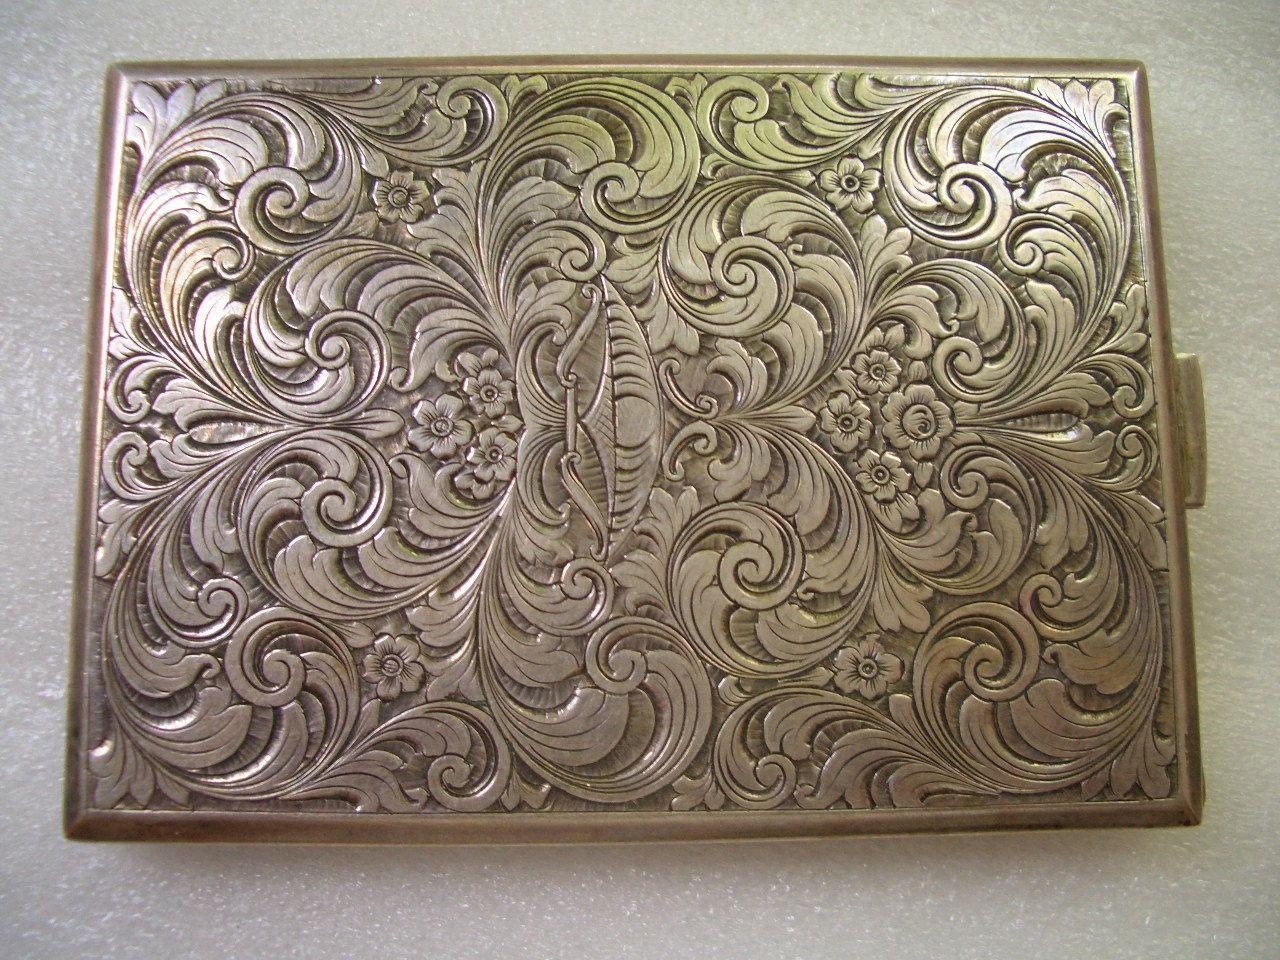 Antique silver engraved case | *Purse & Pocket Pretties: Silver ...